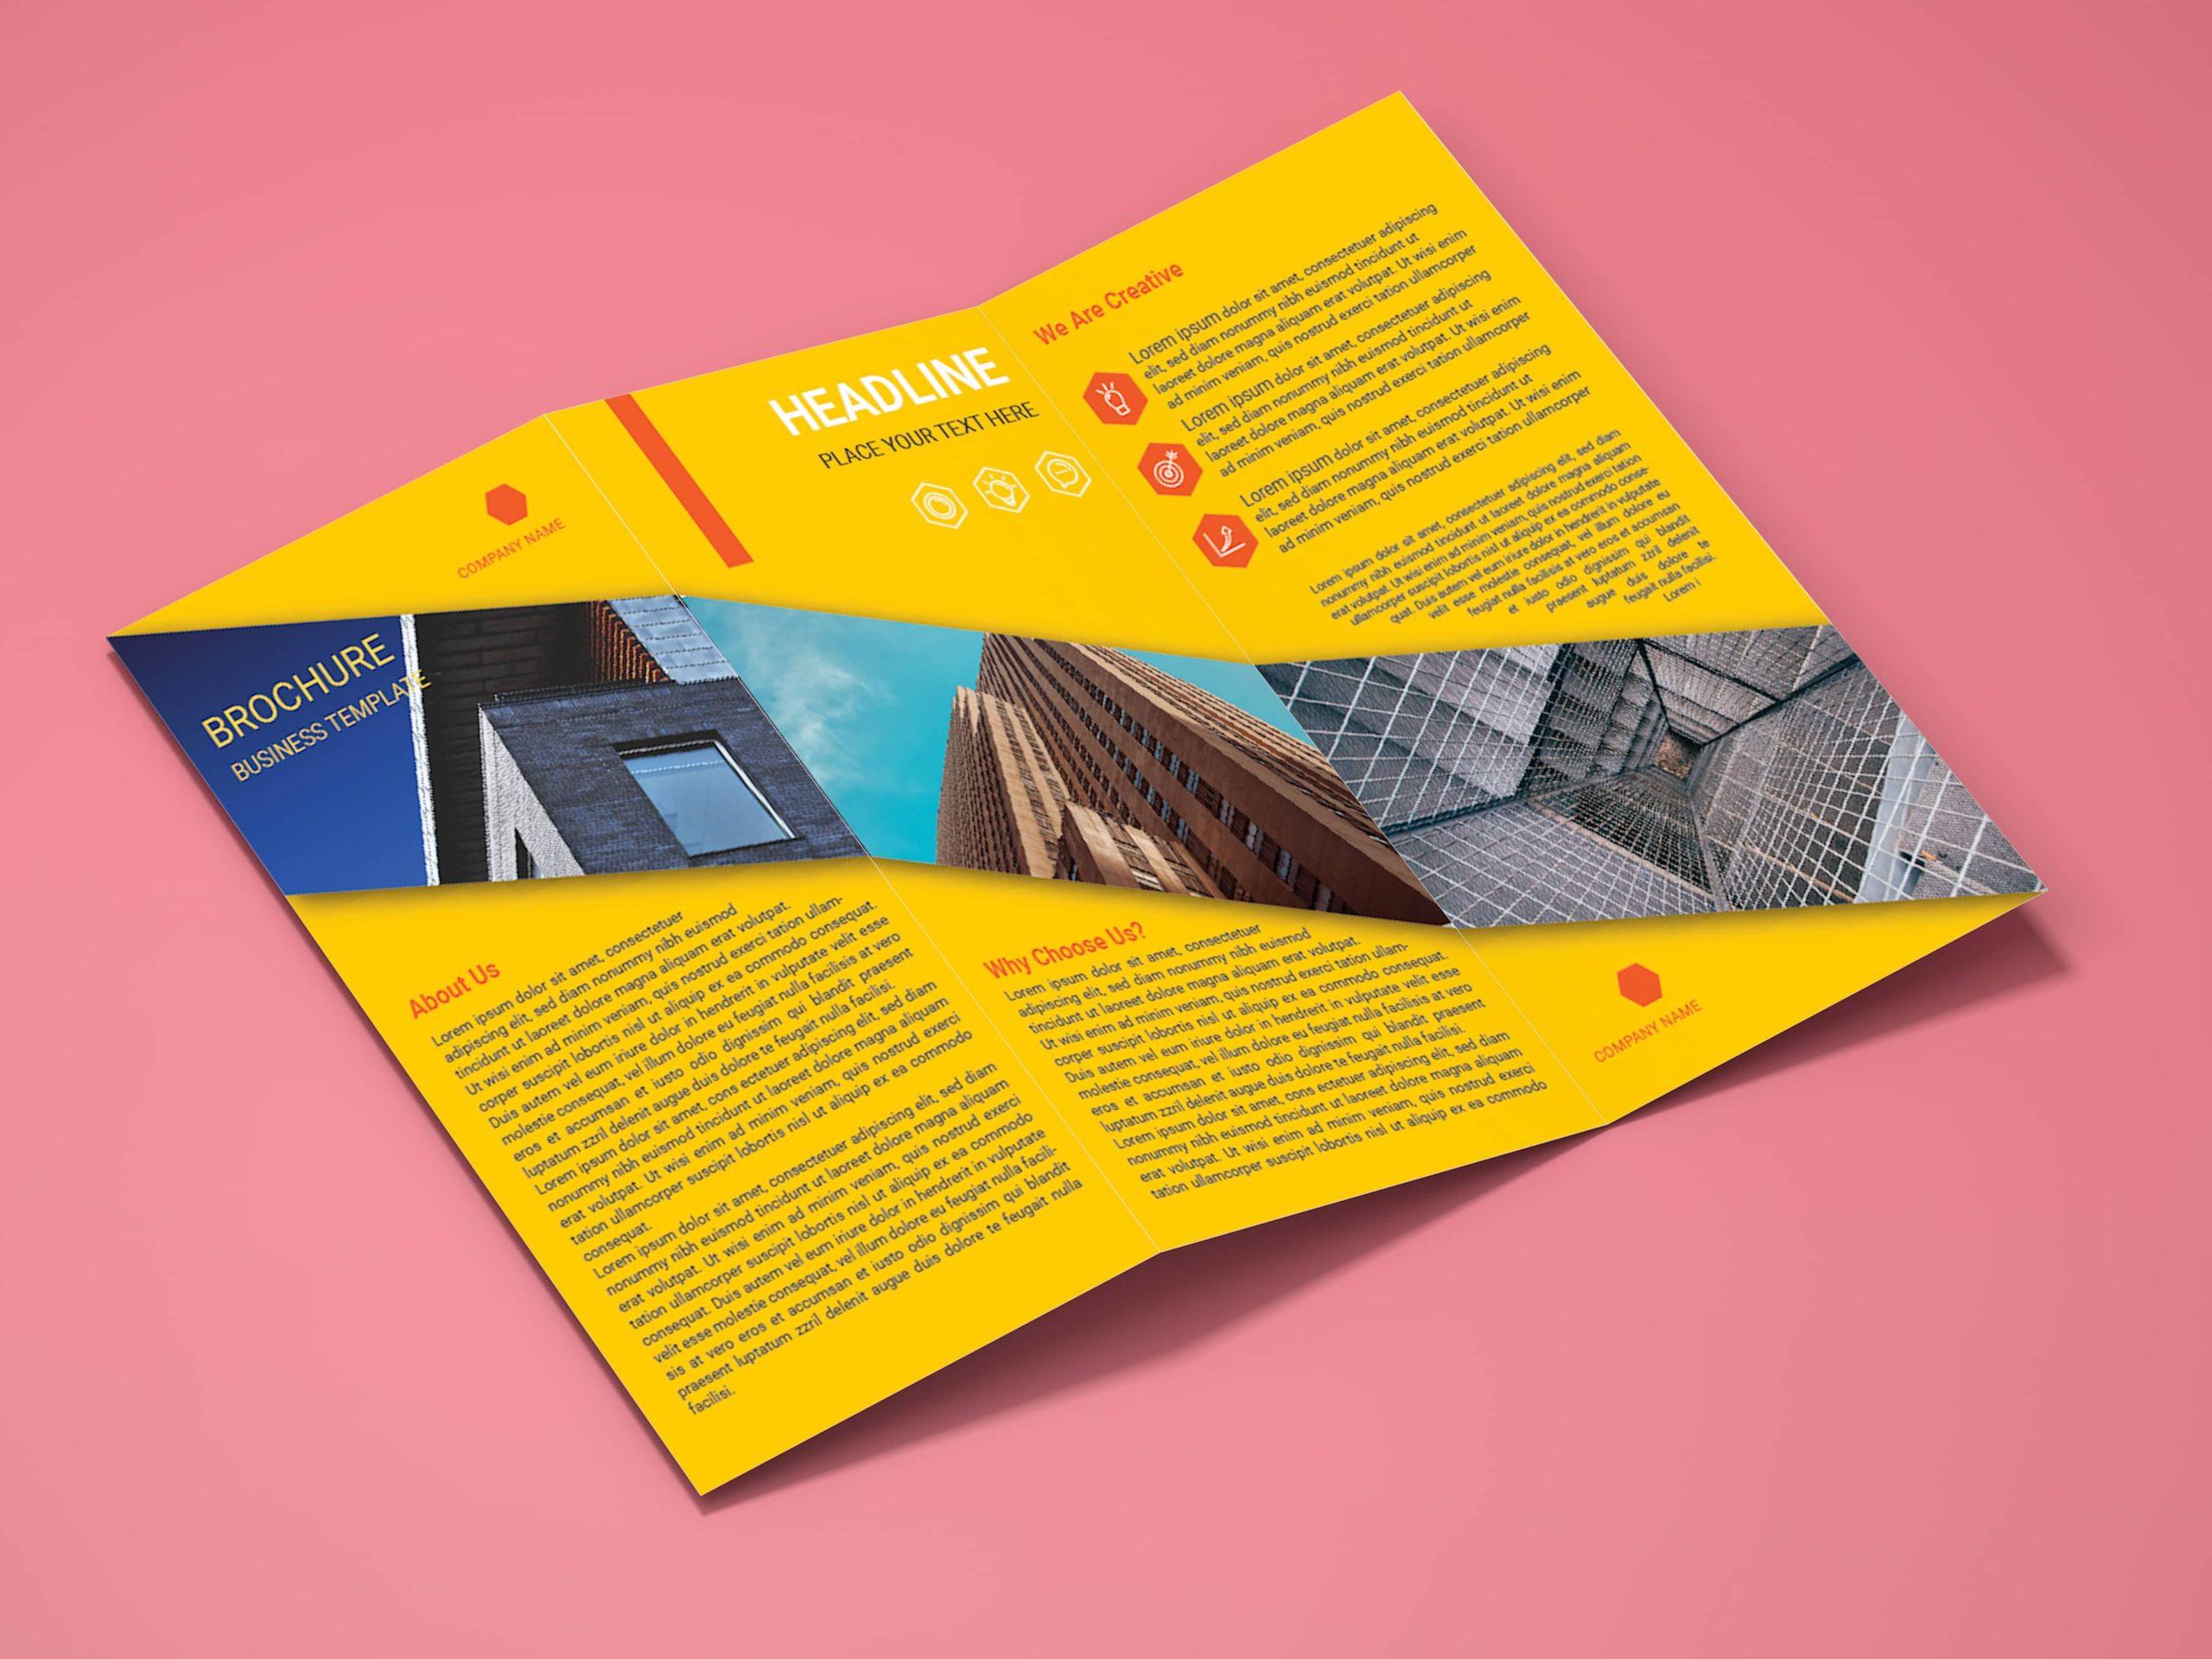 Corporate Architectural Firm Flyer Design Inside mock-up